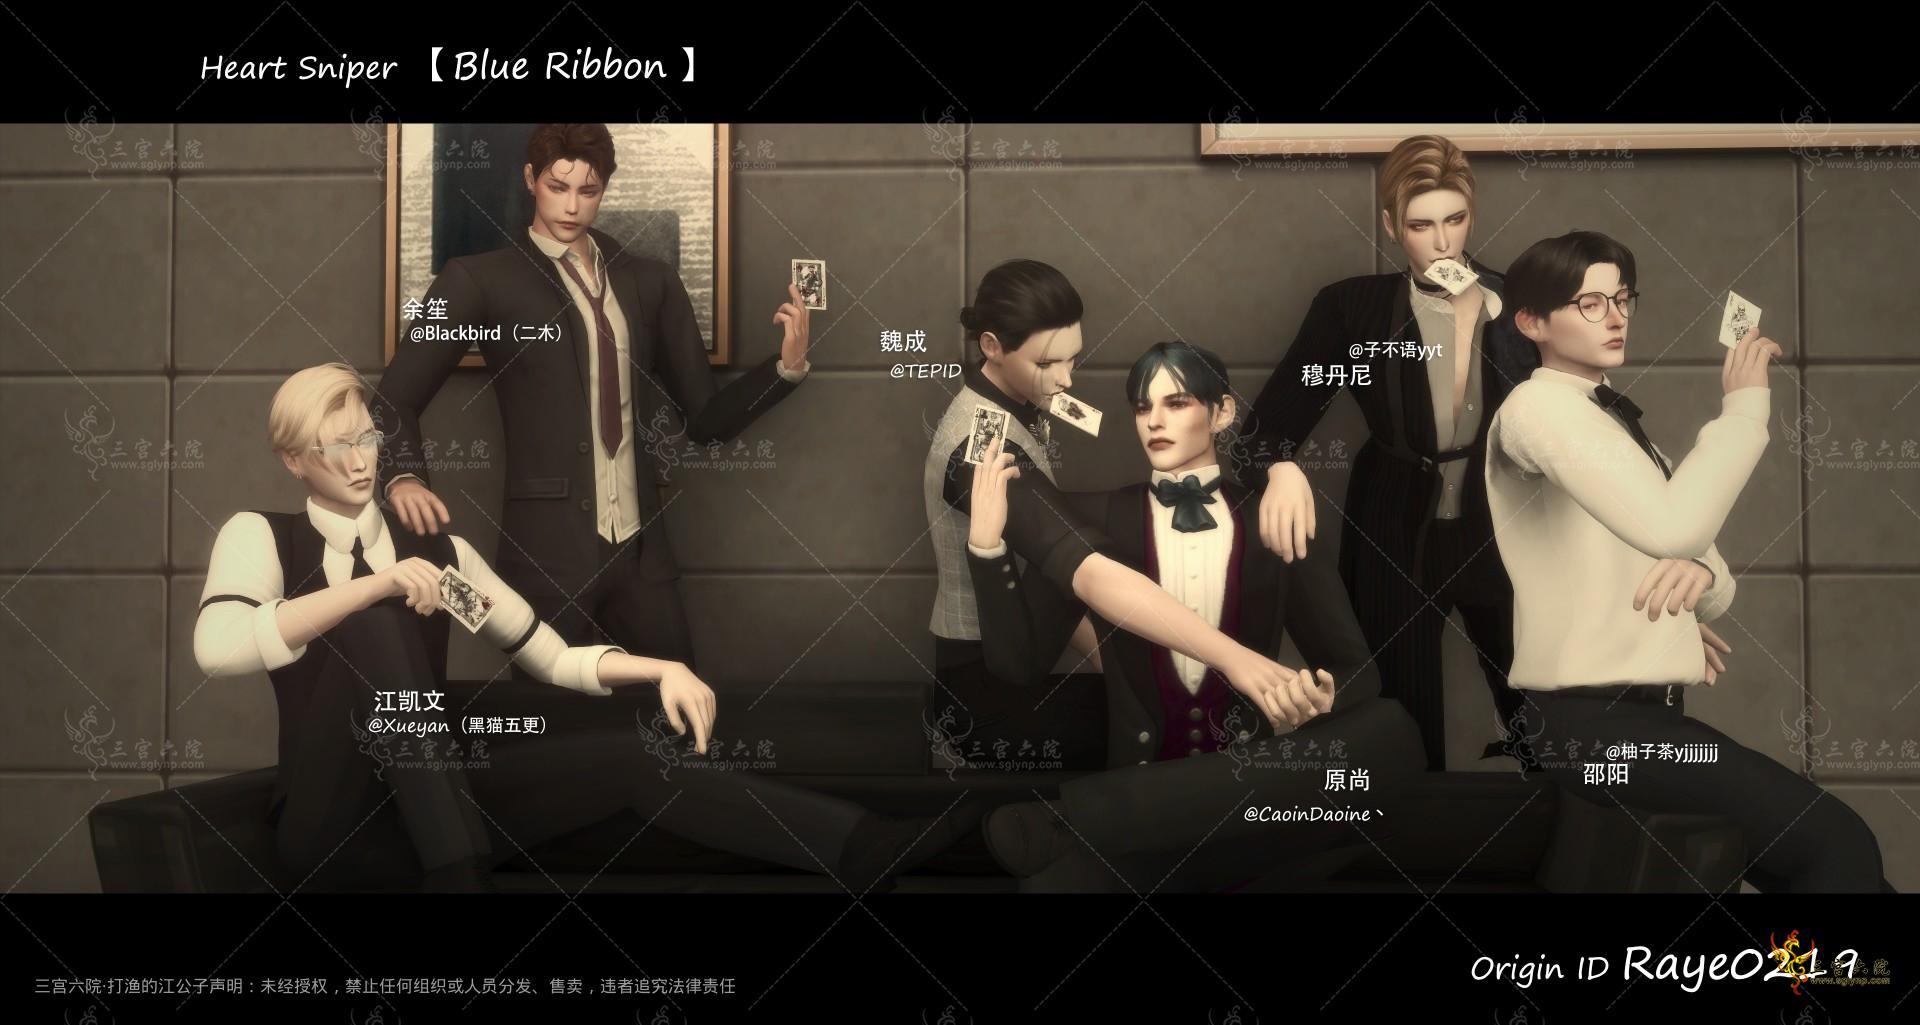 HS III [BLUE RIBBON] 01.png